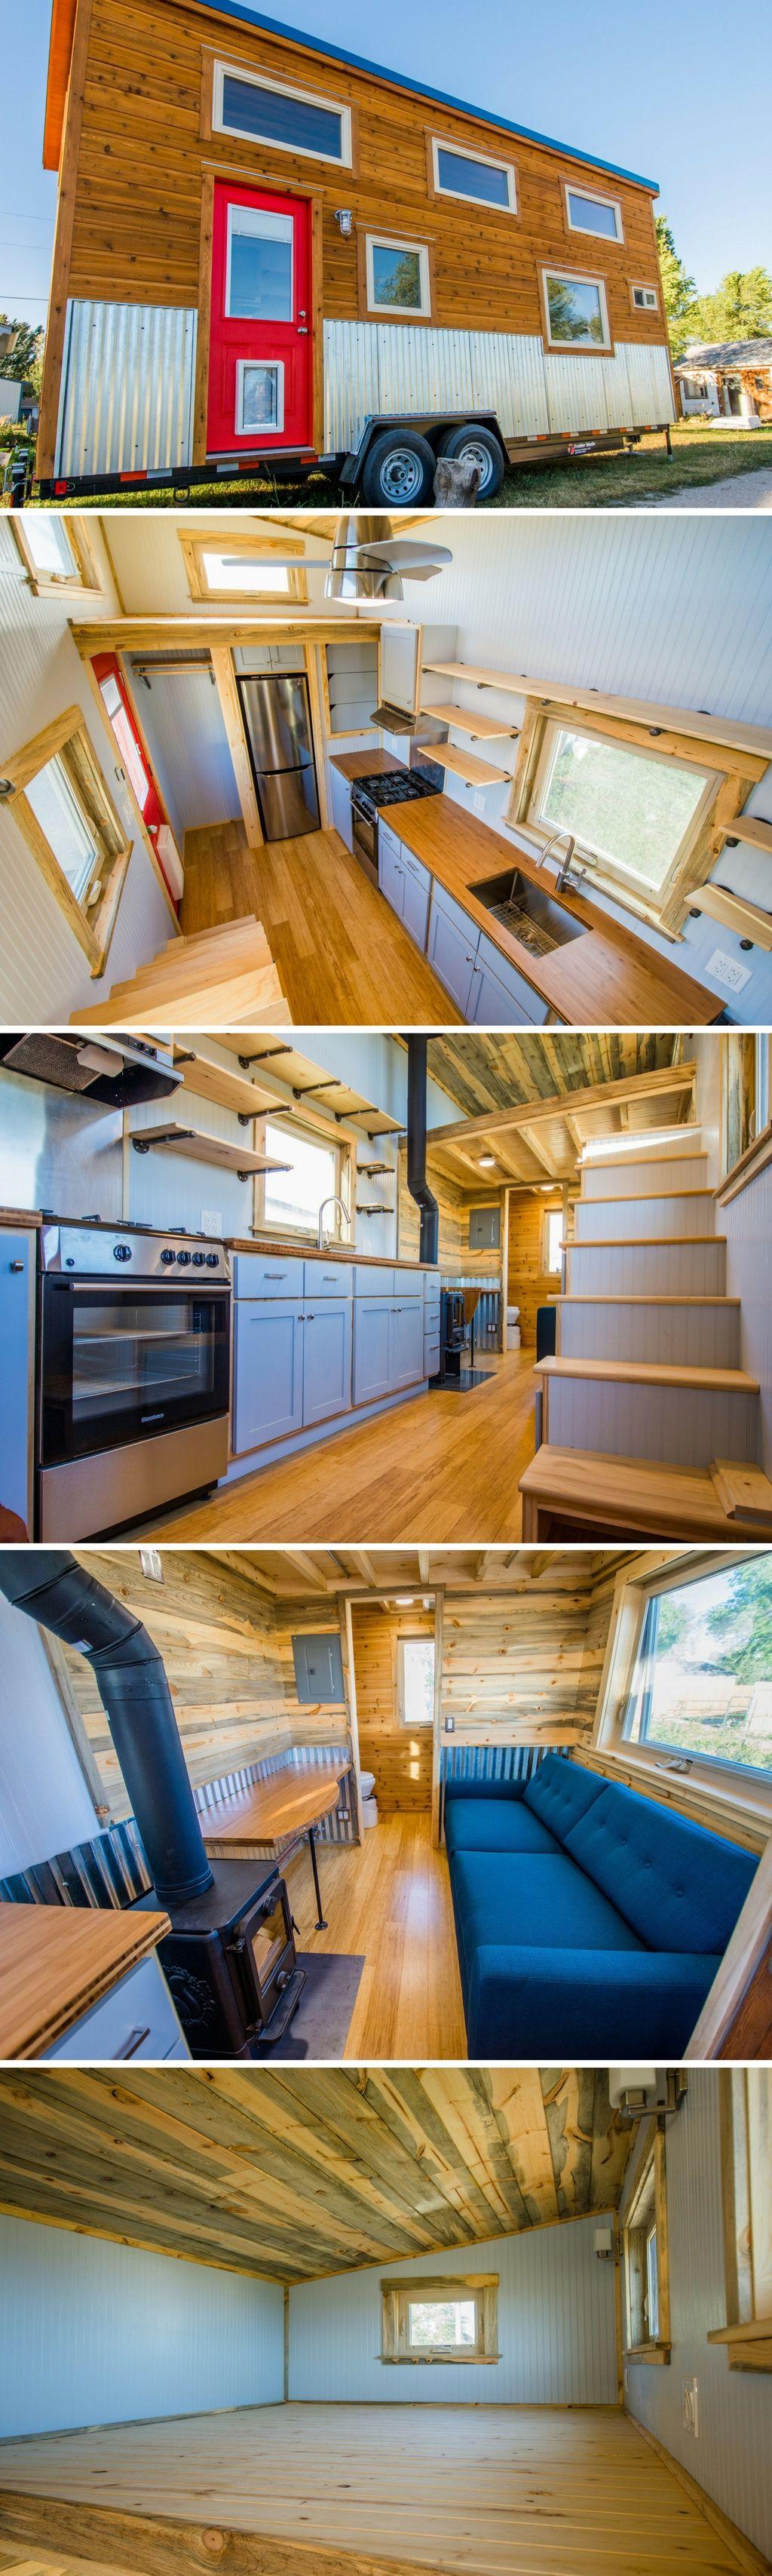 A 192 sq ft tiny house